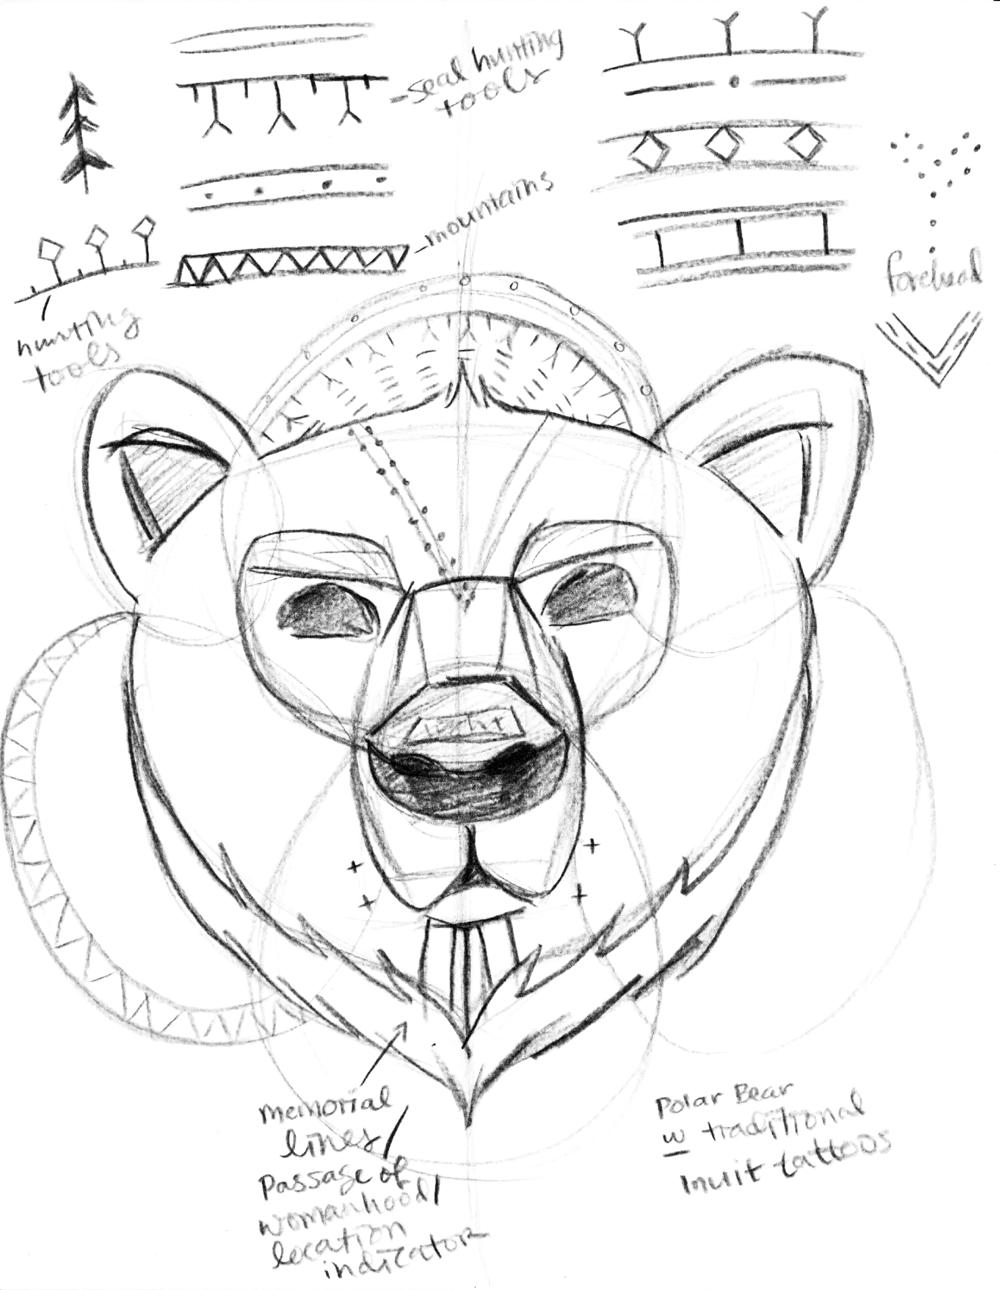 Polar Bear - image 2 - student project